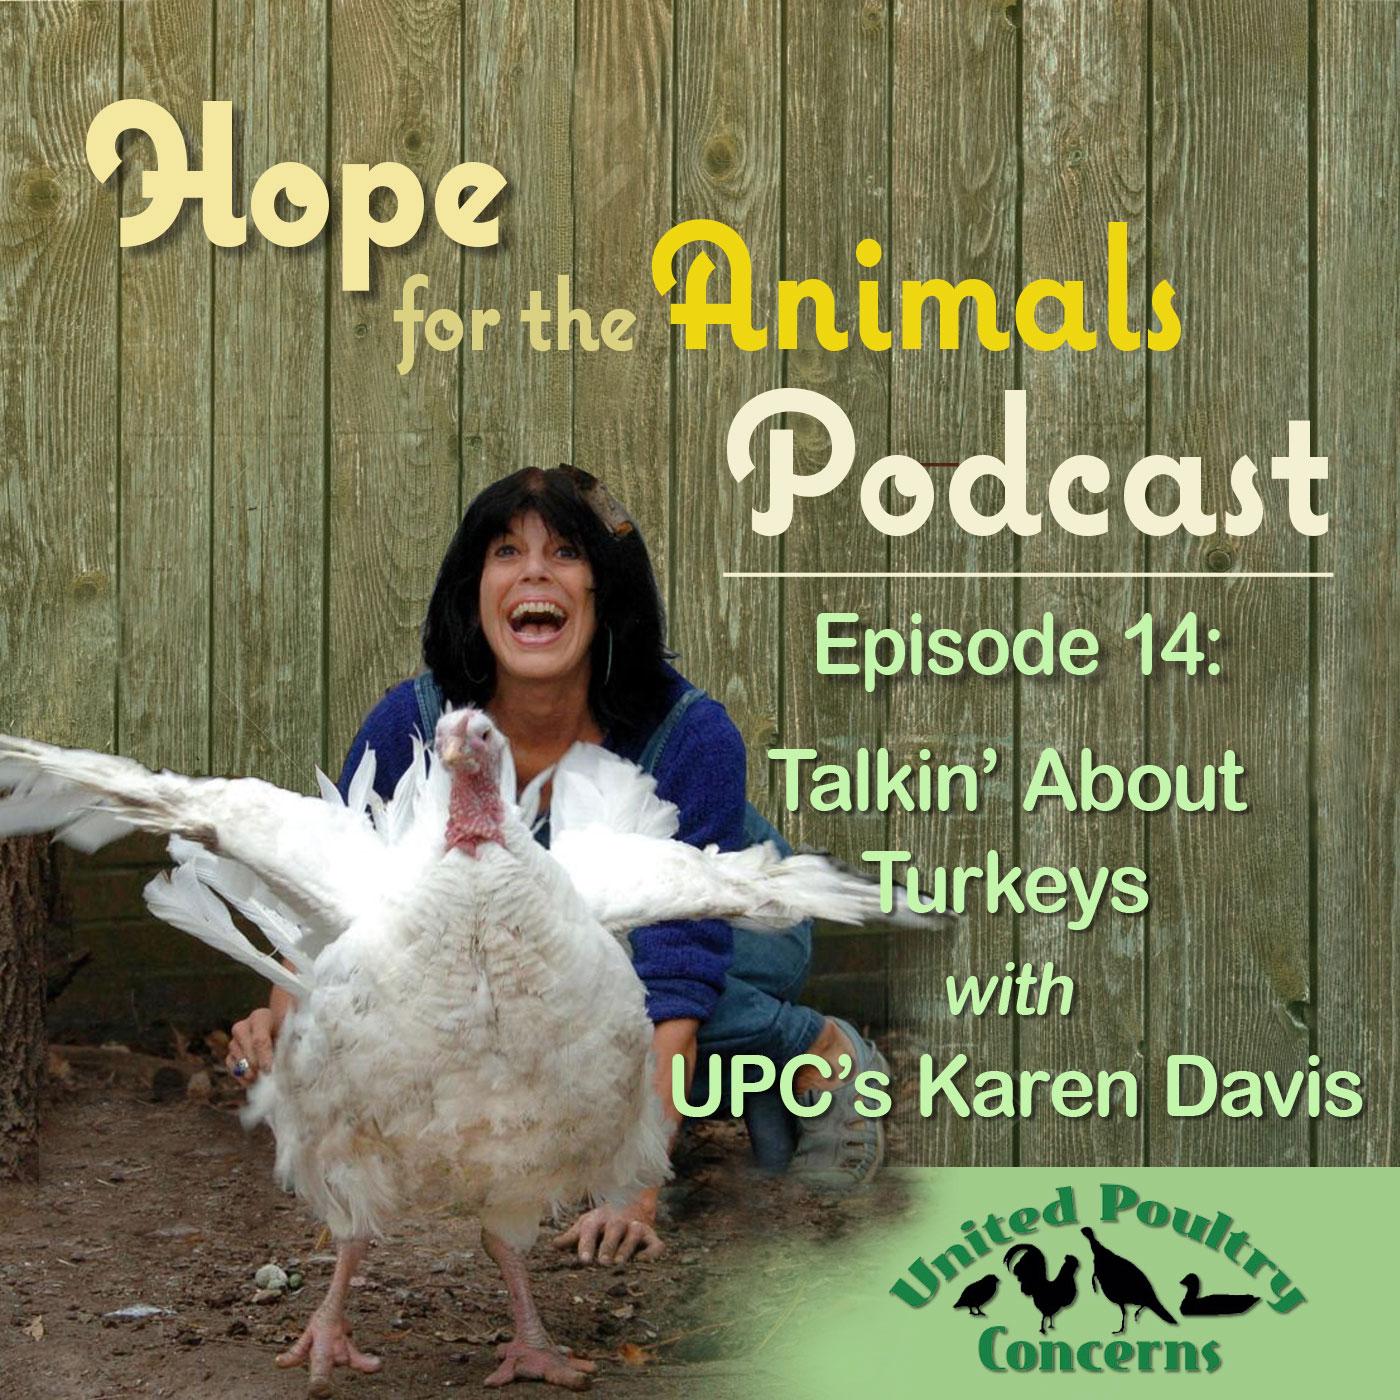 Karen Davis laughing with a turkey